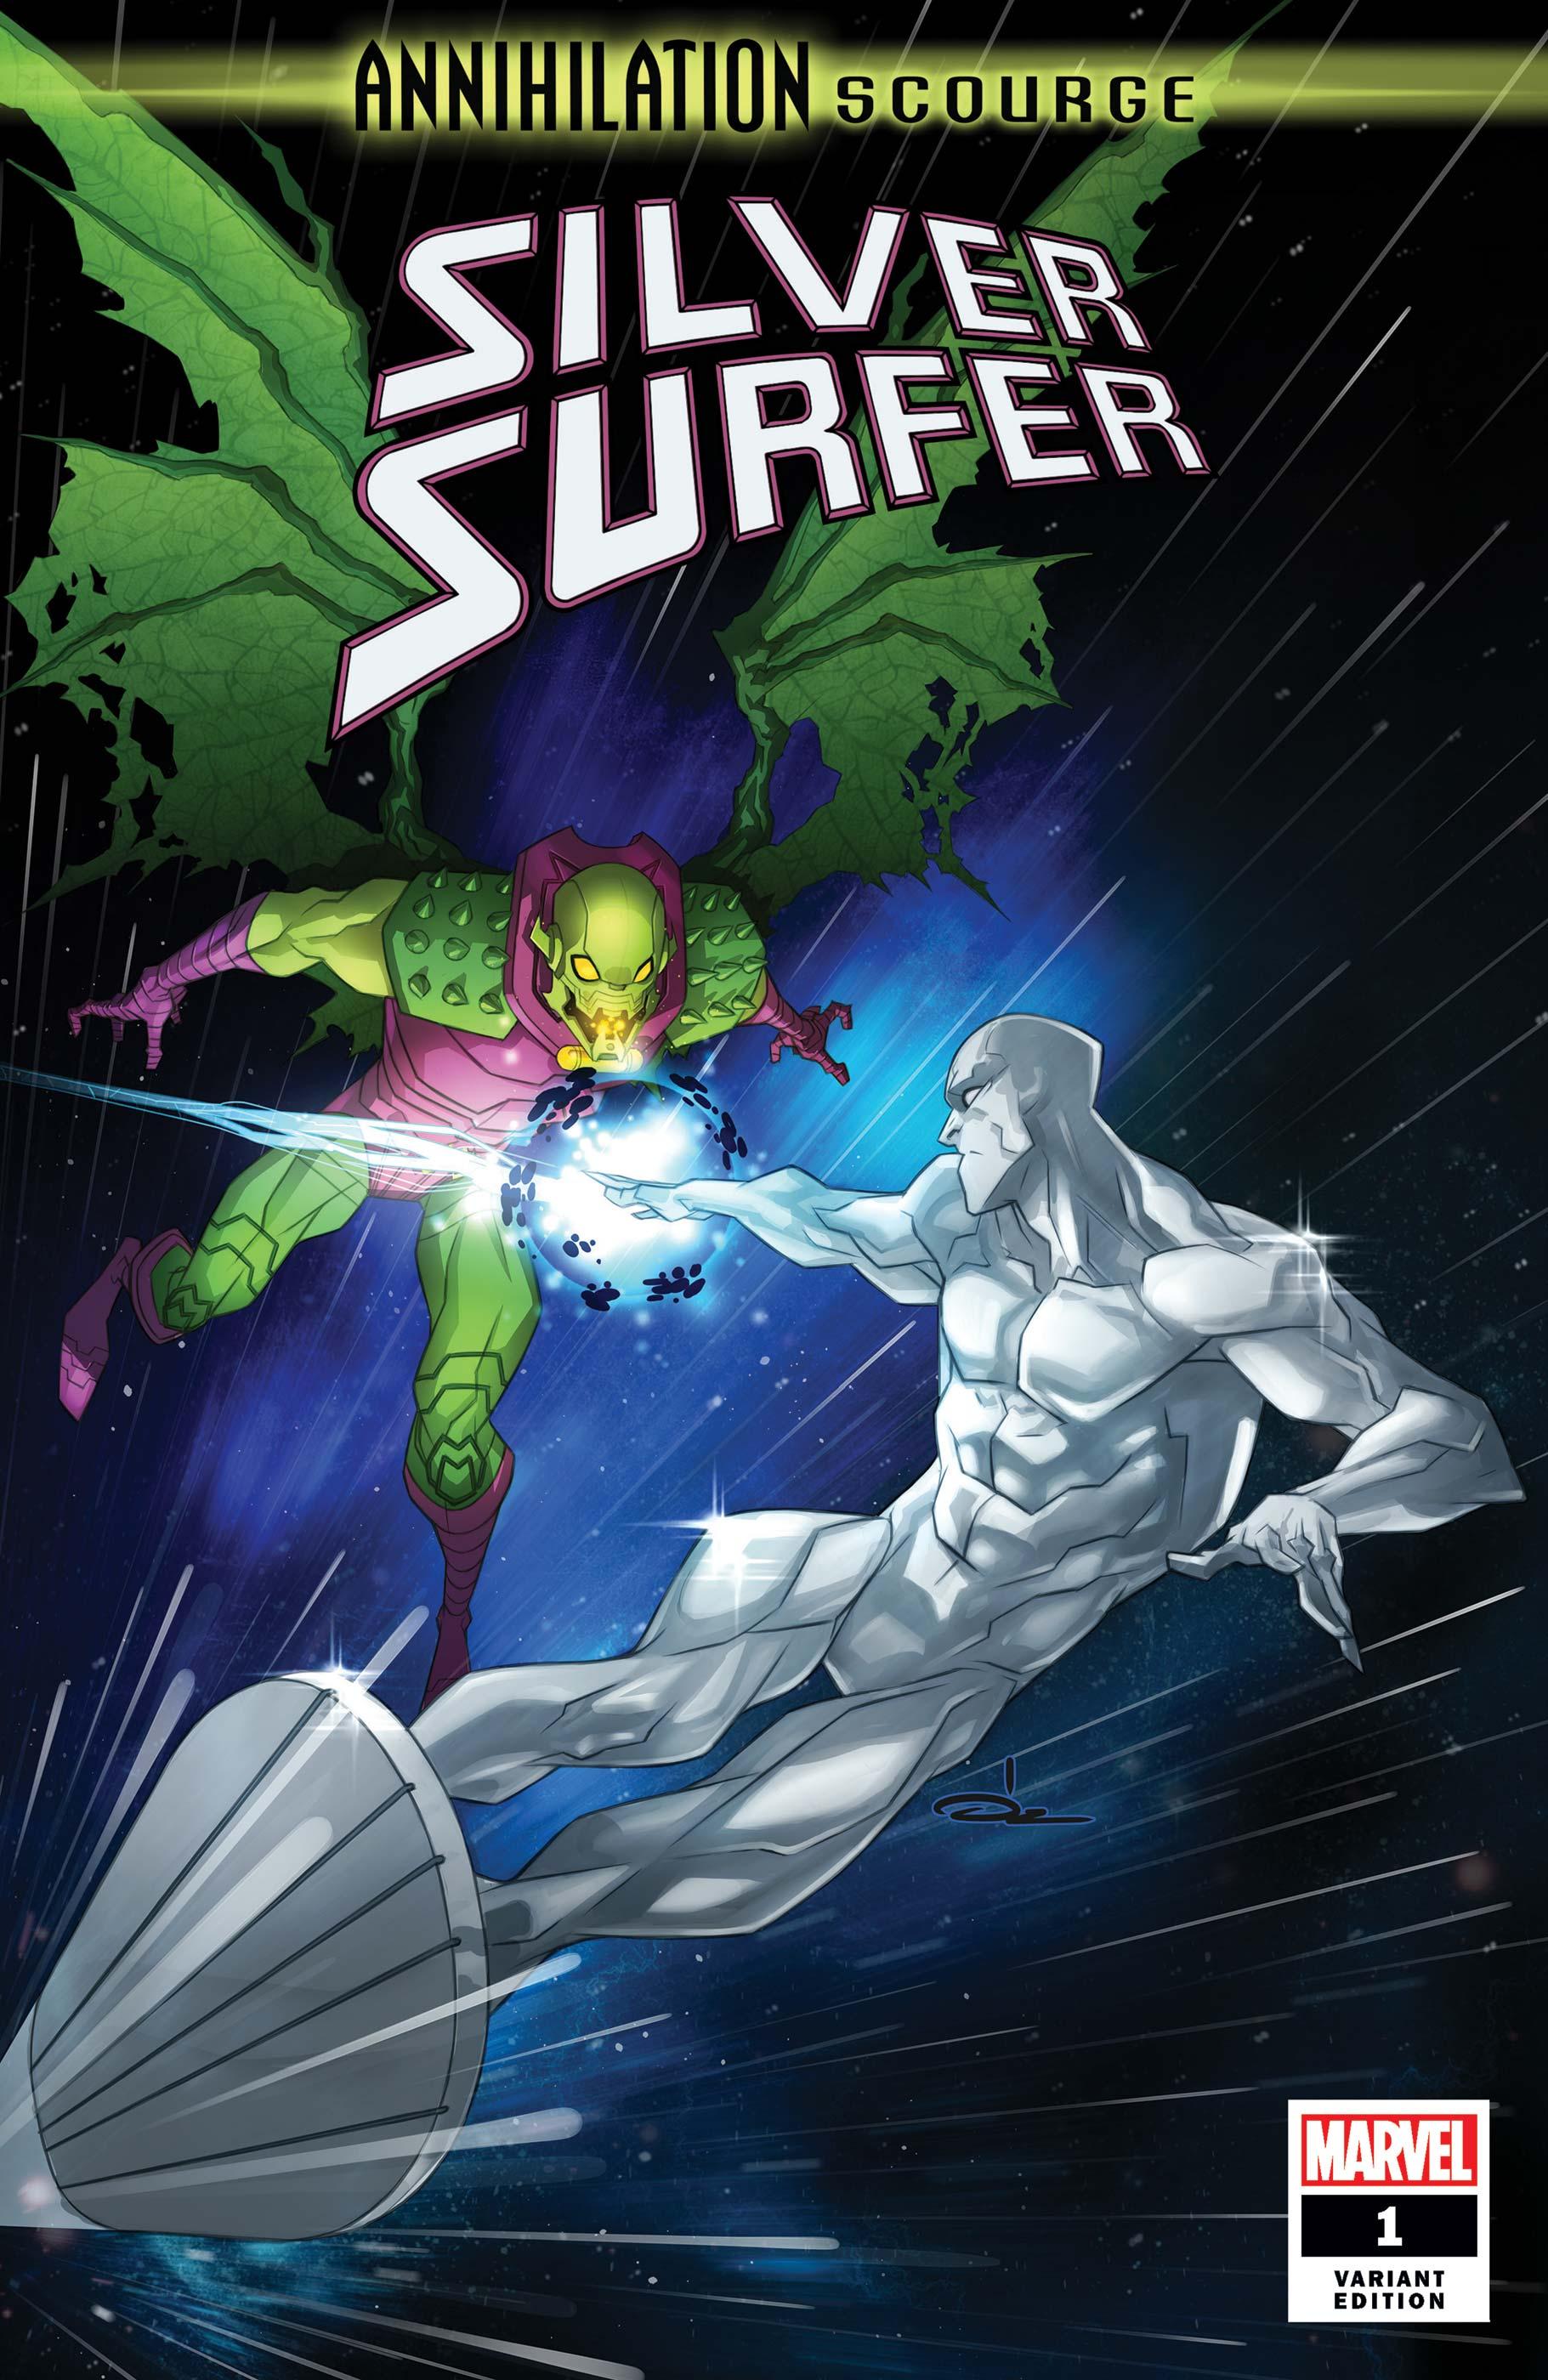 Annihilation - Scourge: Silver Surfer (2019) #1 (Variant)